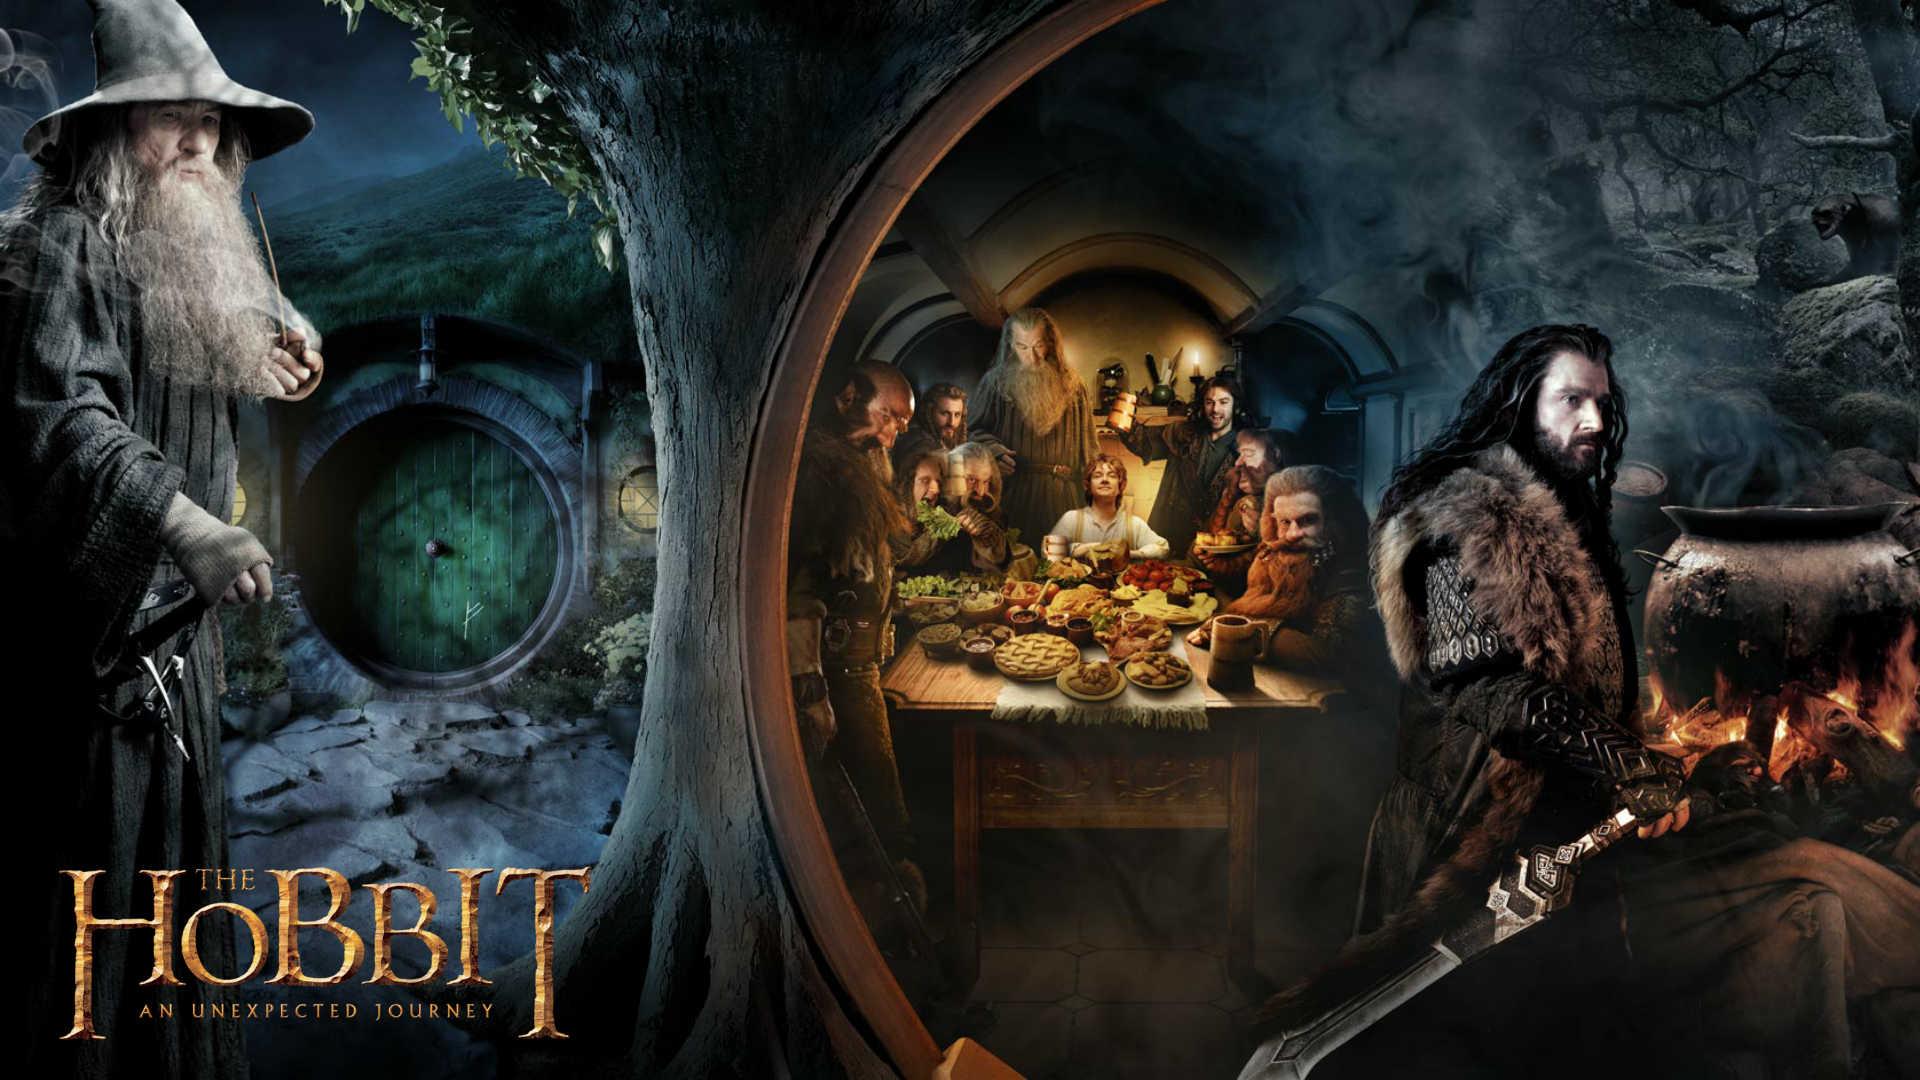 2012 The Hobbit Wallpapers HD Wallpapers 1920x1080